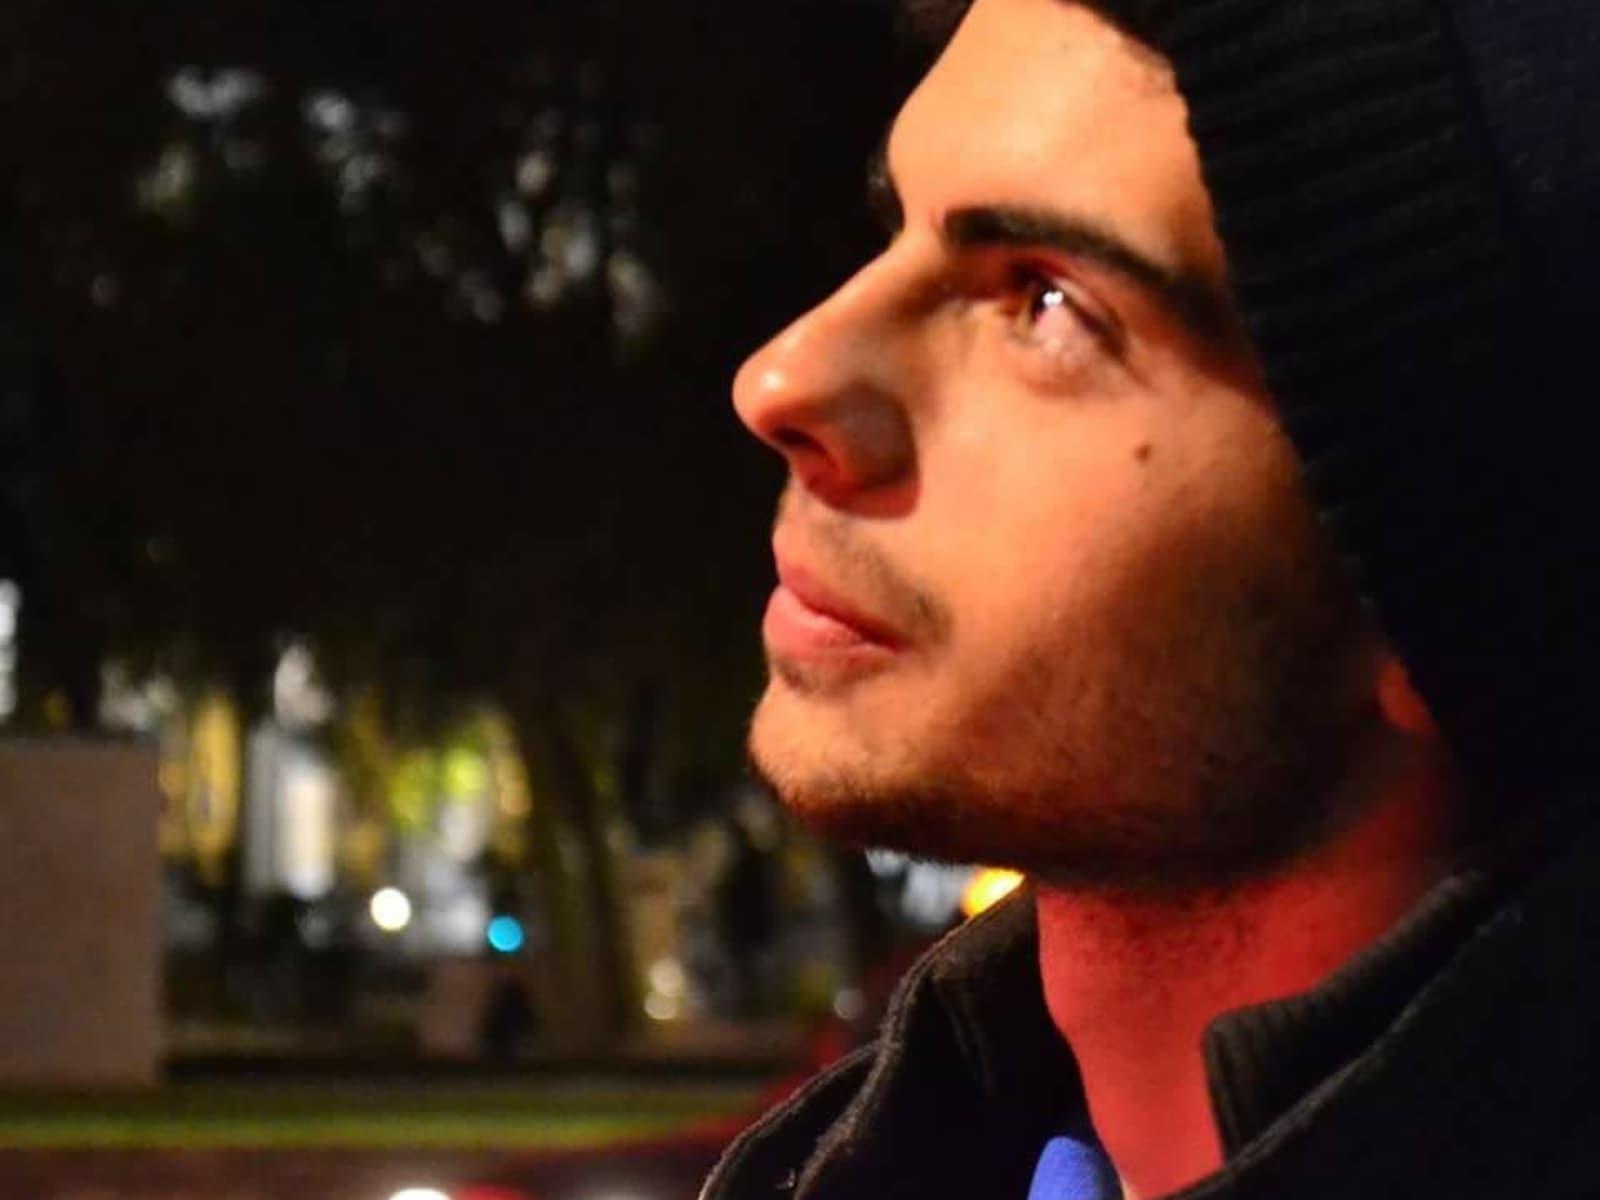 Darren from London, United Kingdom